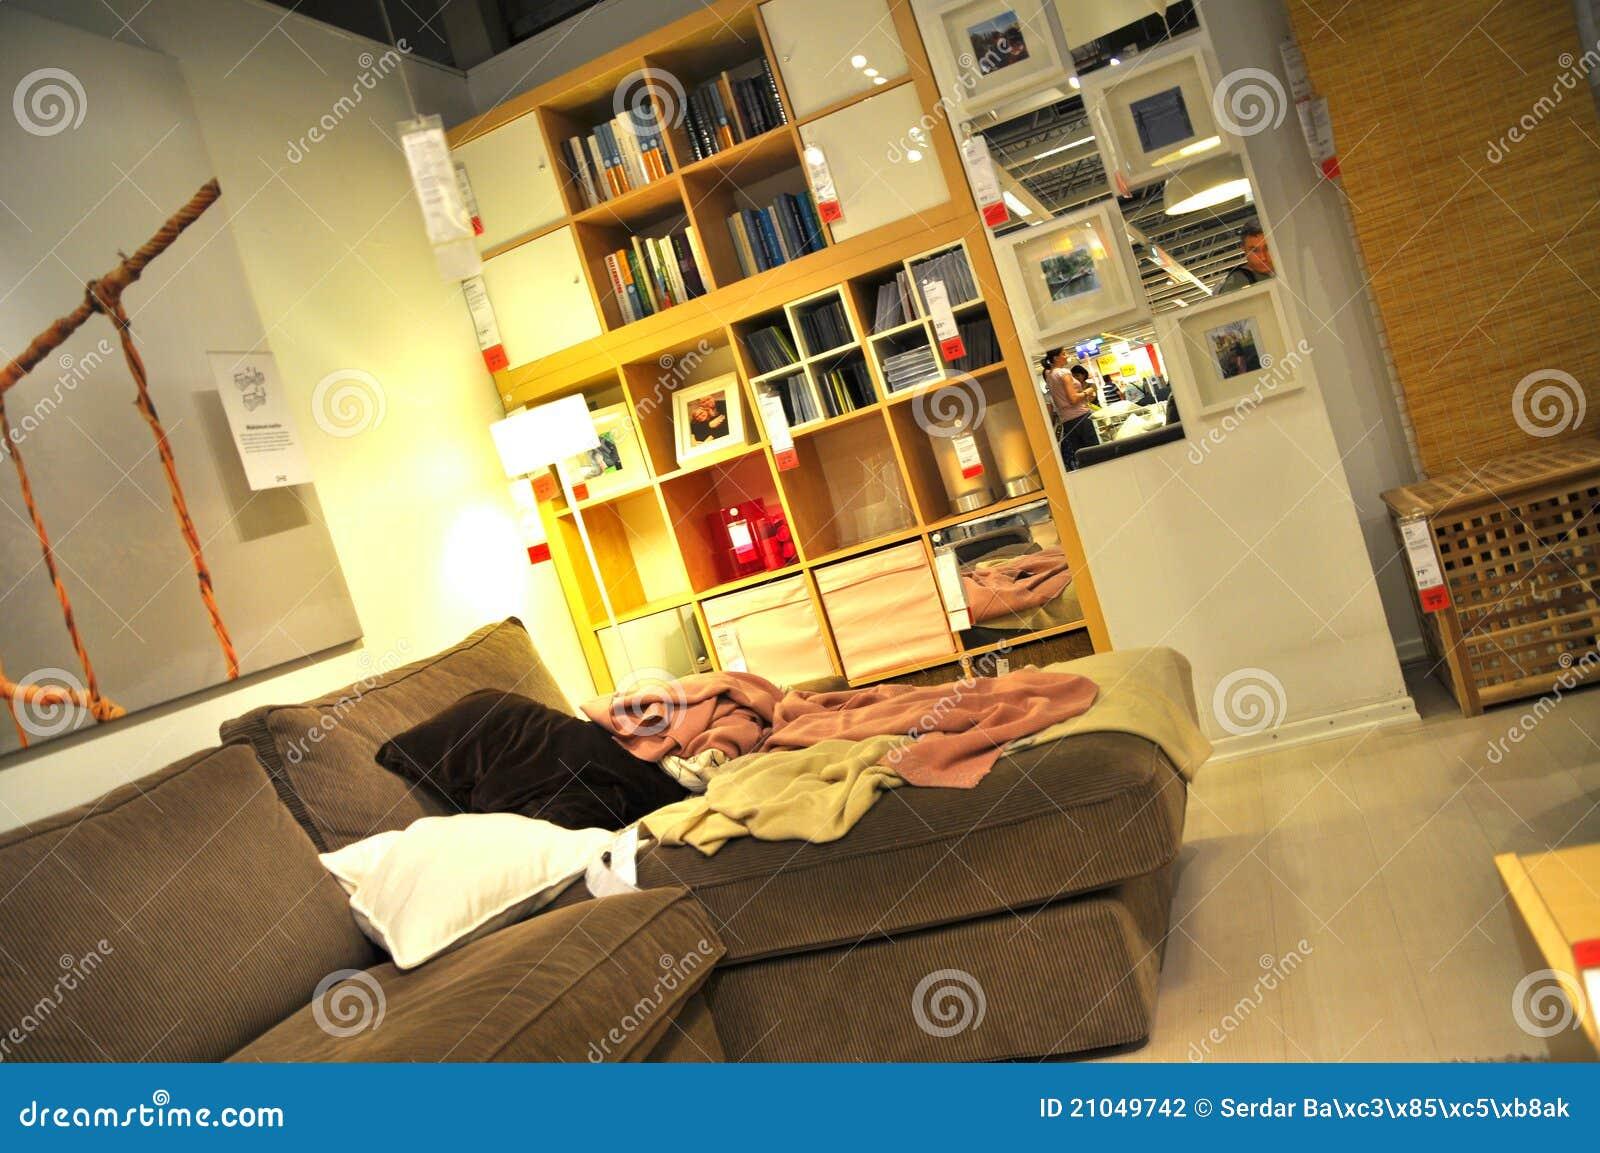 De verbetering van het huis opslag redactionele fotografie afbeelding 21049742 - Huisverbetering m ...